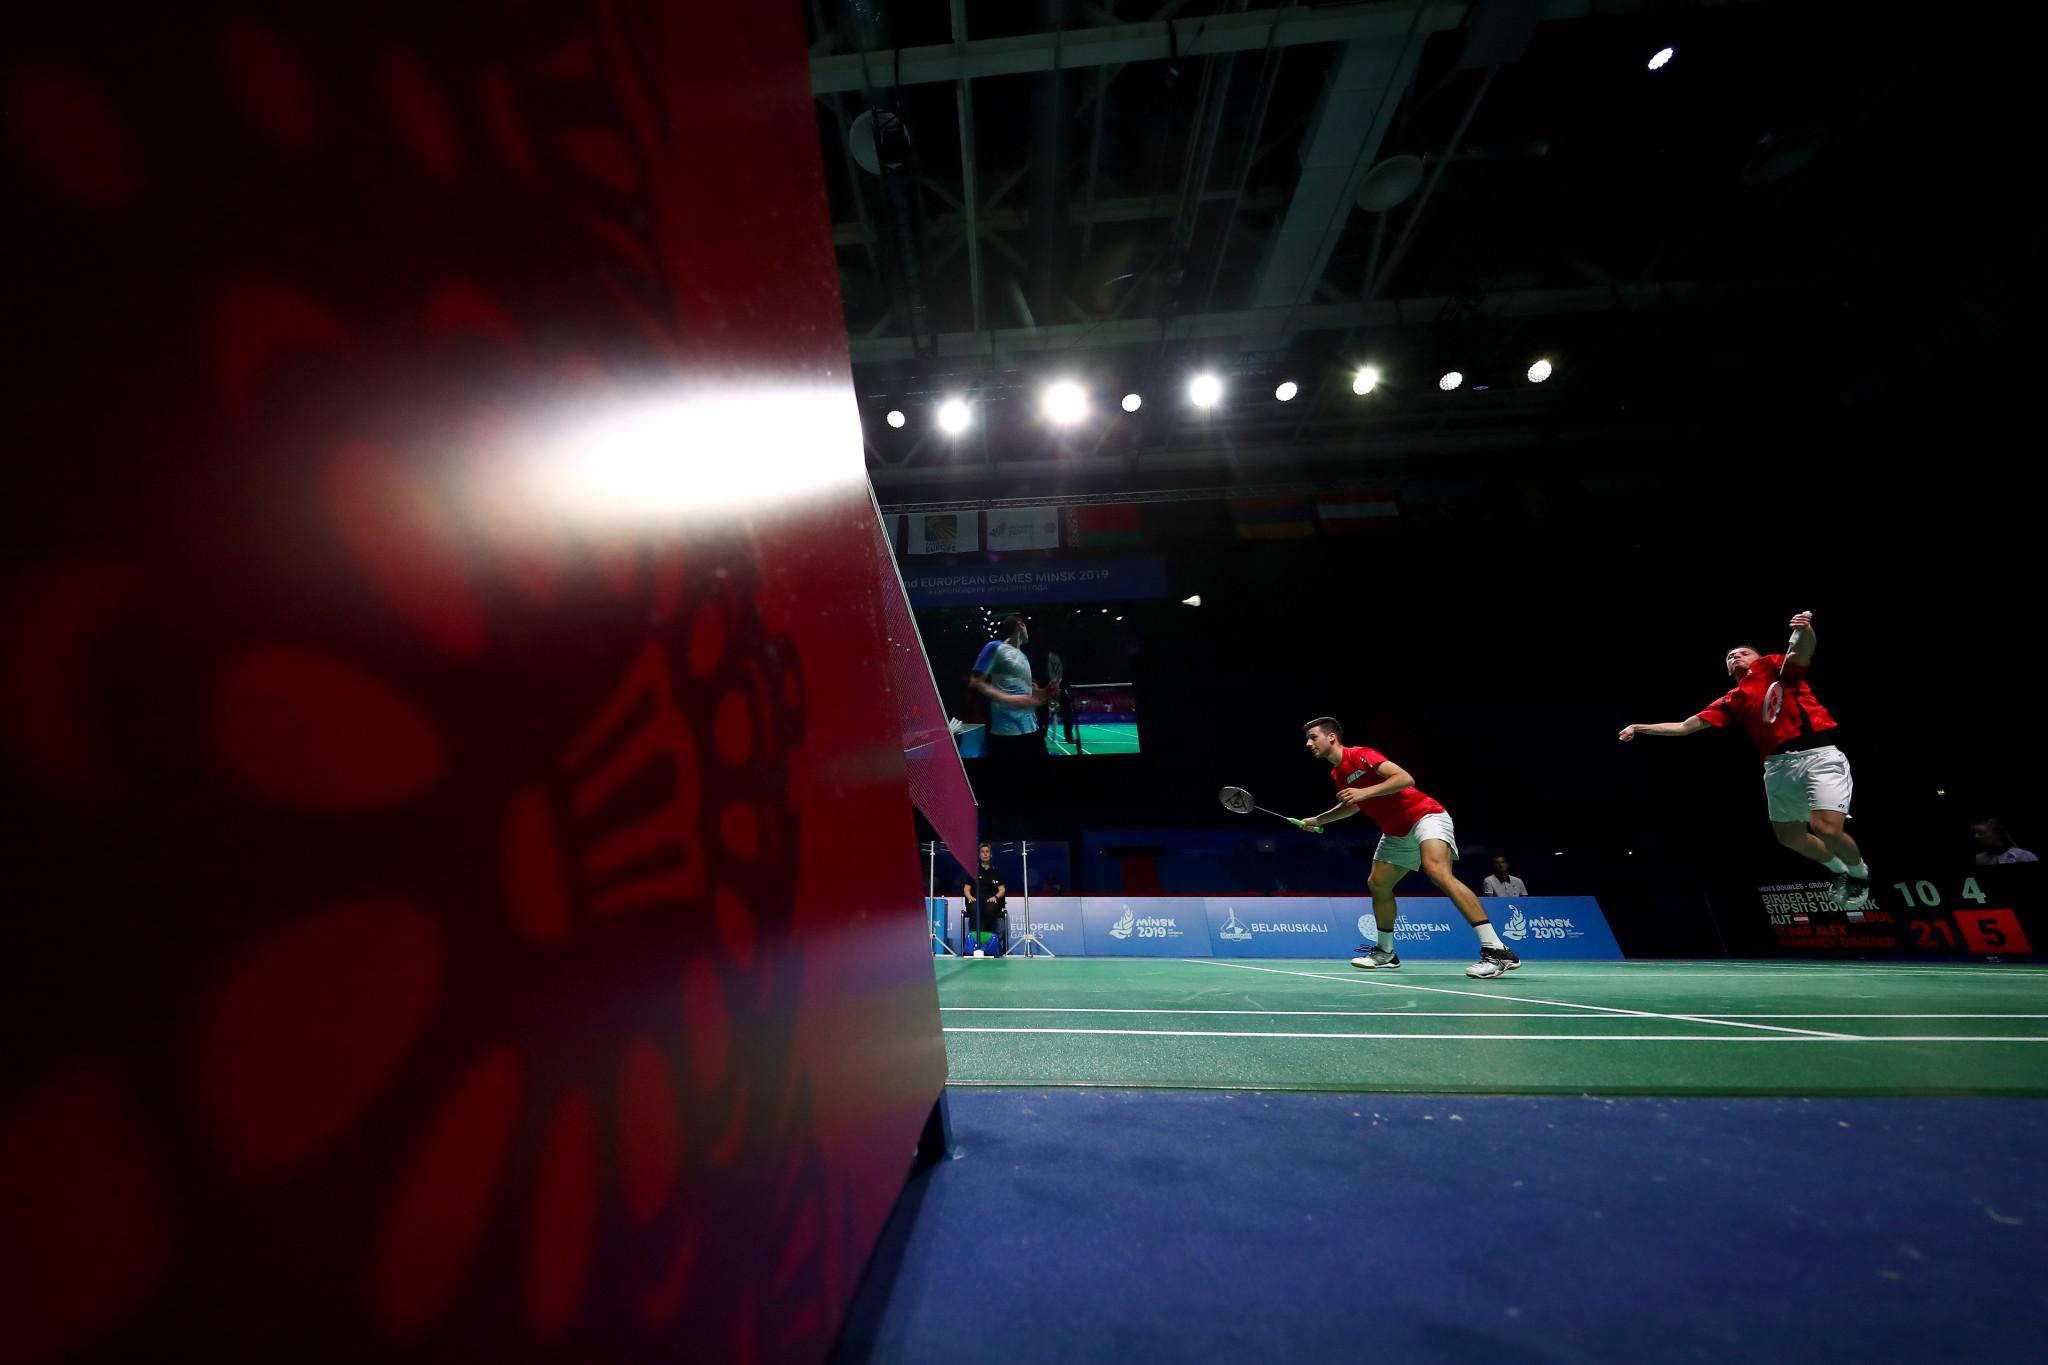 Bulgaria's men shock Spain at European Team Badminton Championships